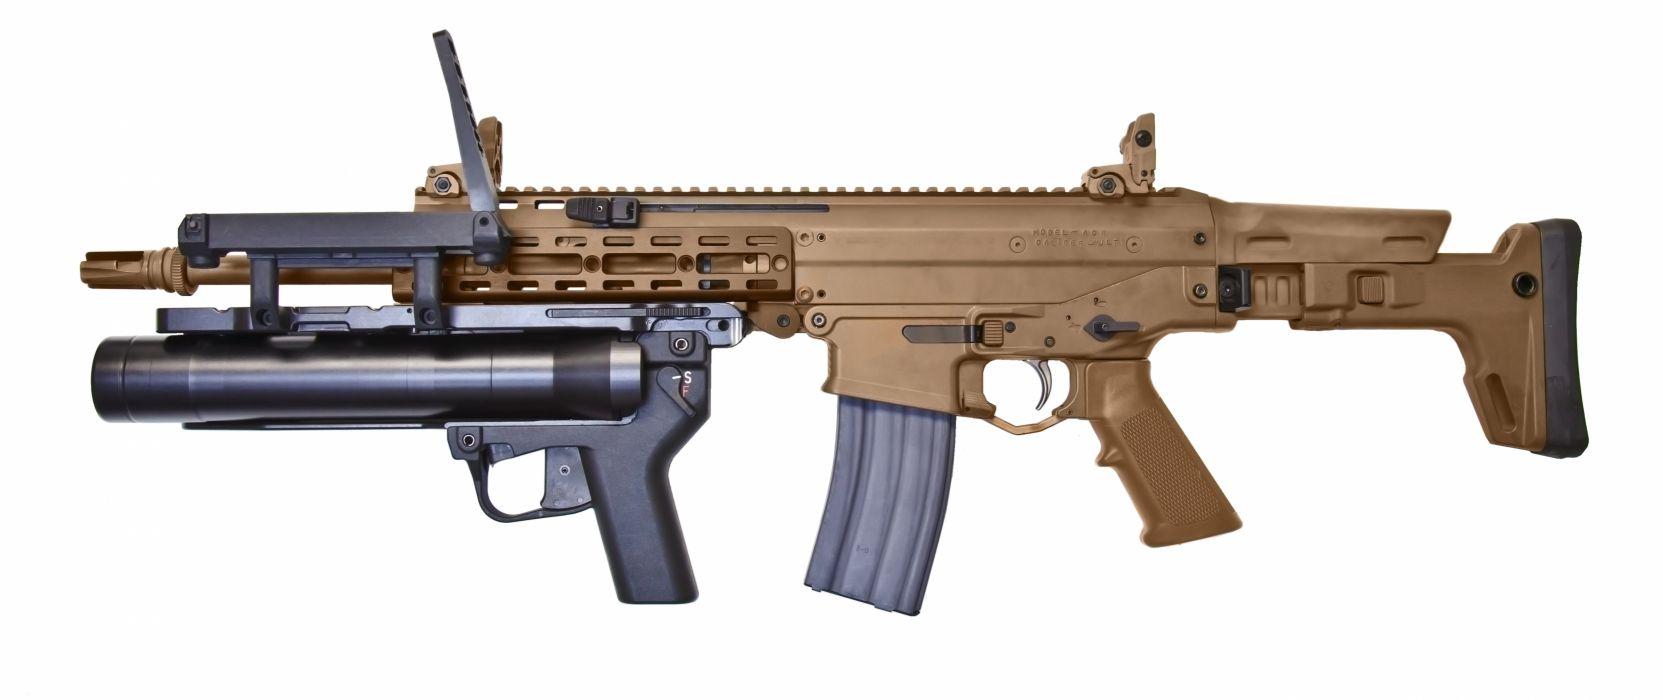 Remington ACR weapon gun military rifle police     g wallpaper